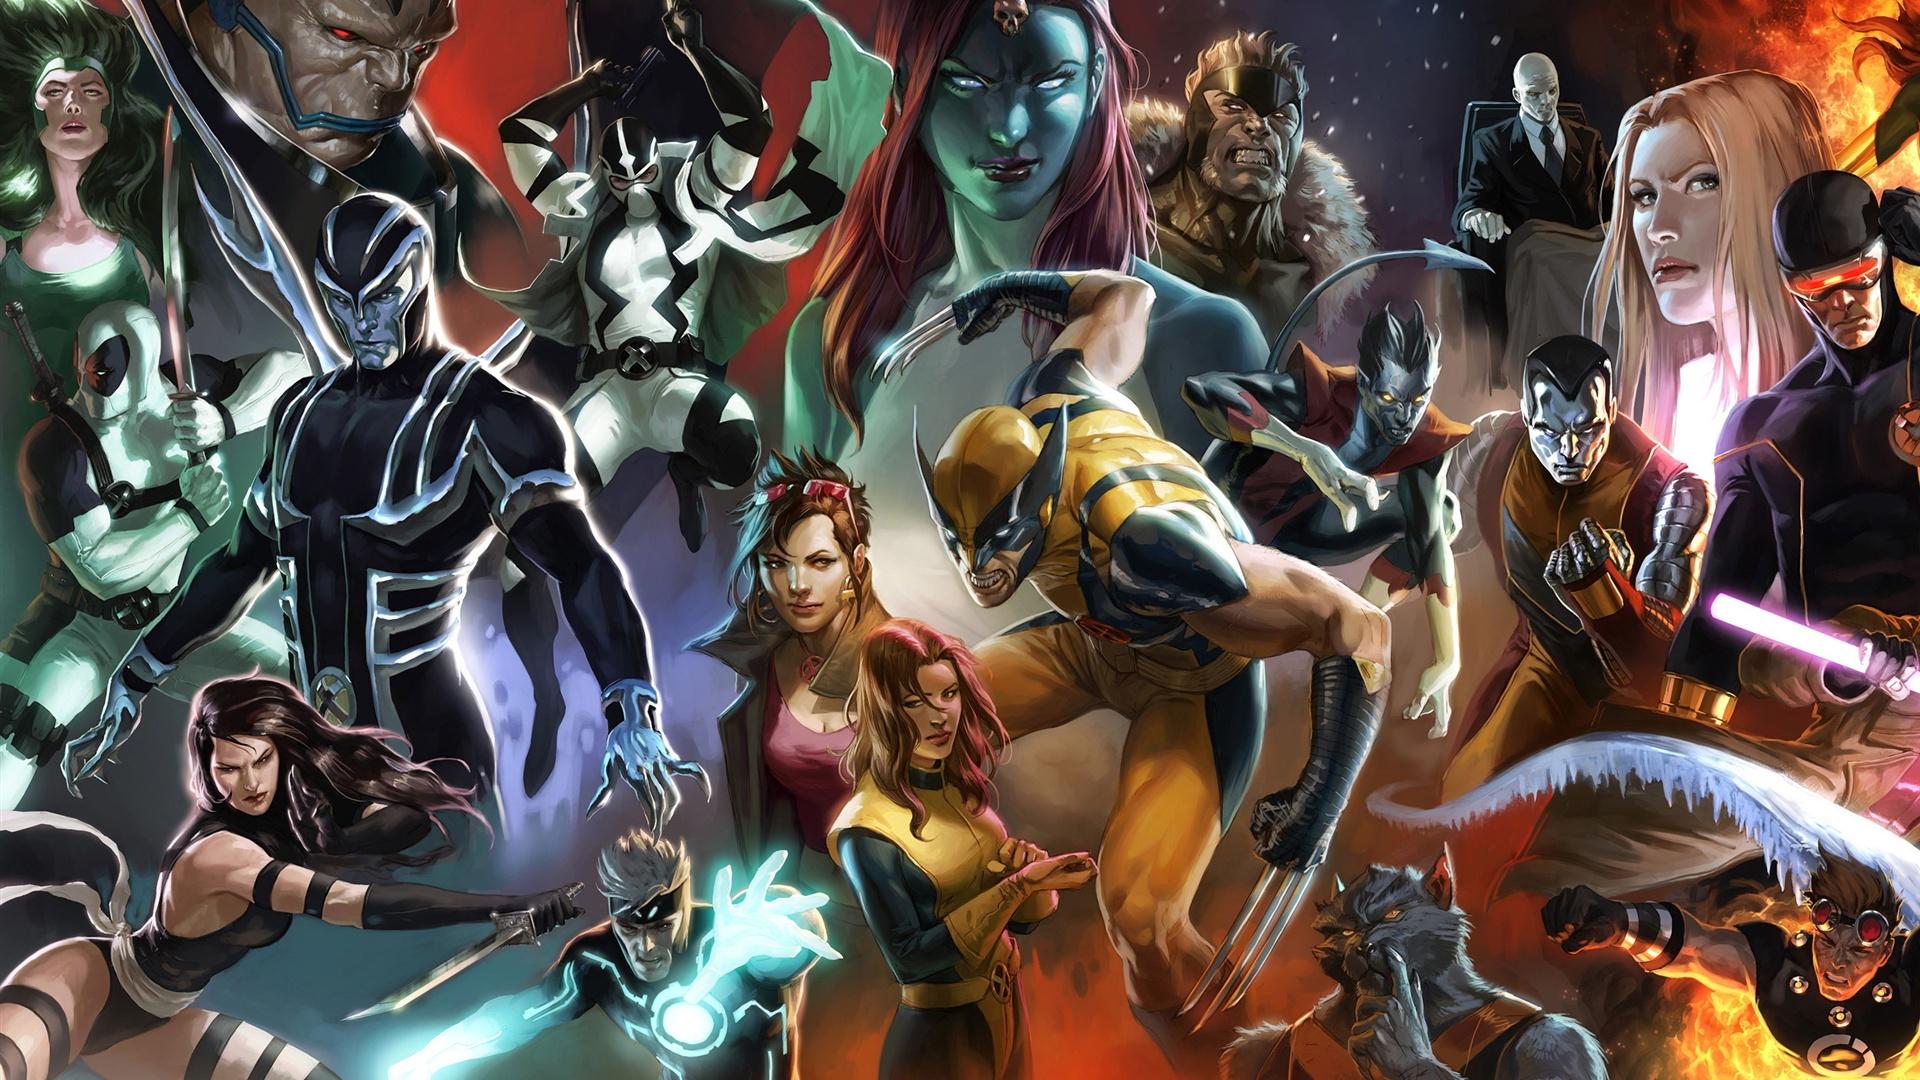 X Men Comics 750x1334 Iphone 8766s Wallpaper Background